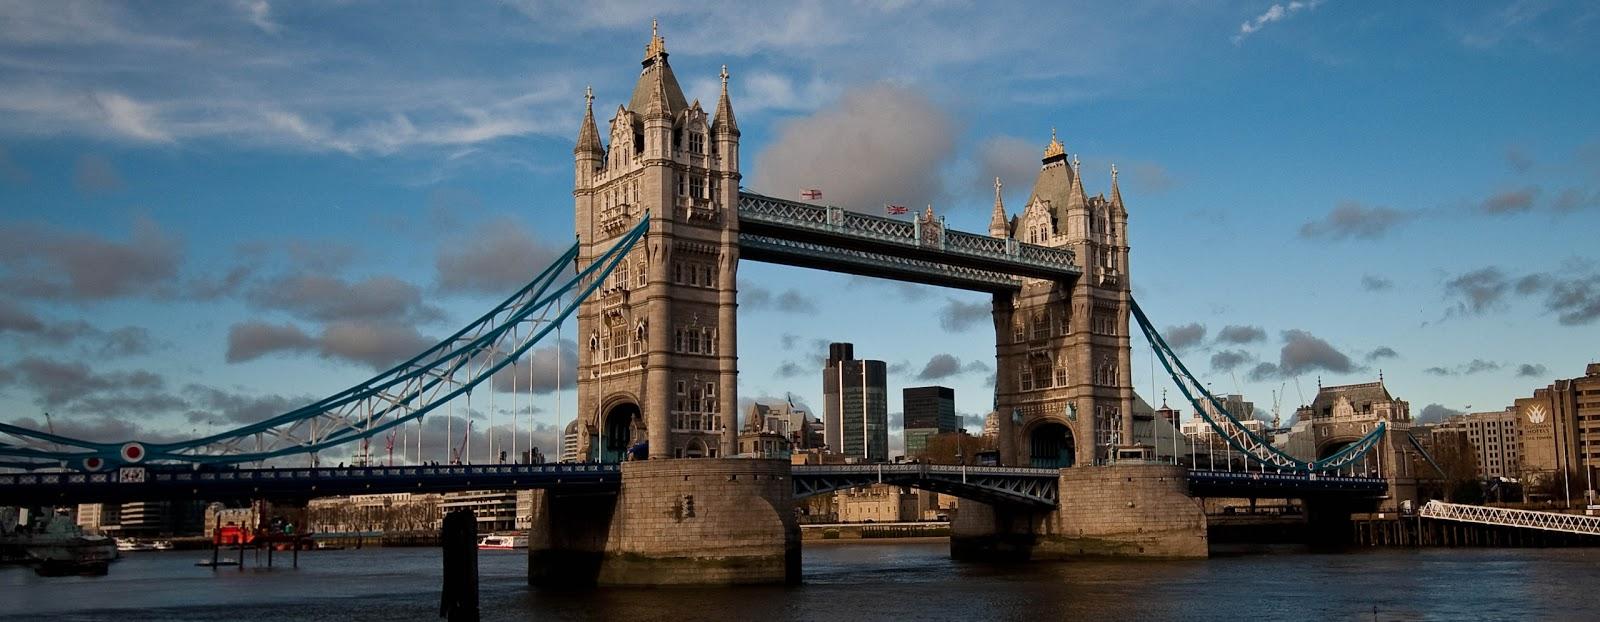 Tower Bridge London Icon Suspension Bridge River Thames 1600x622